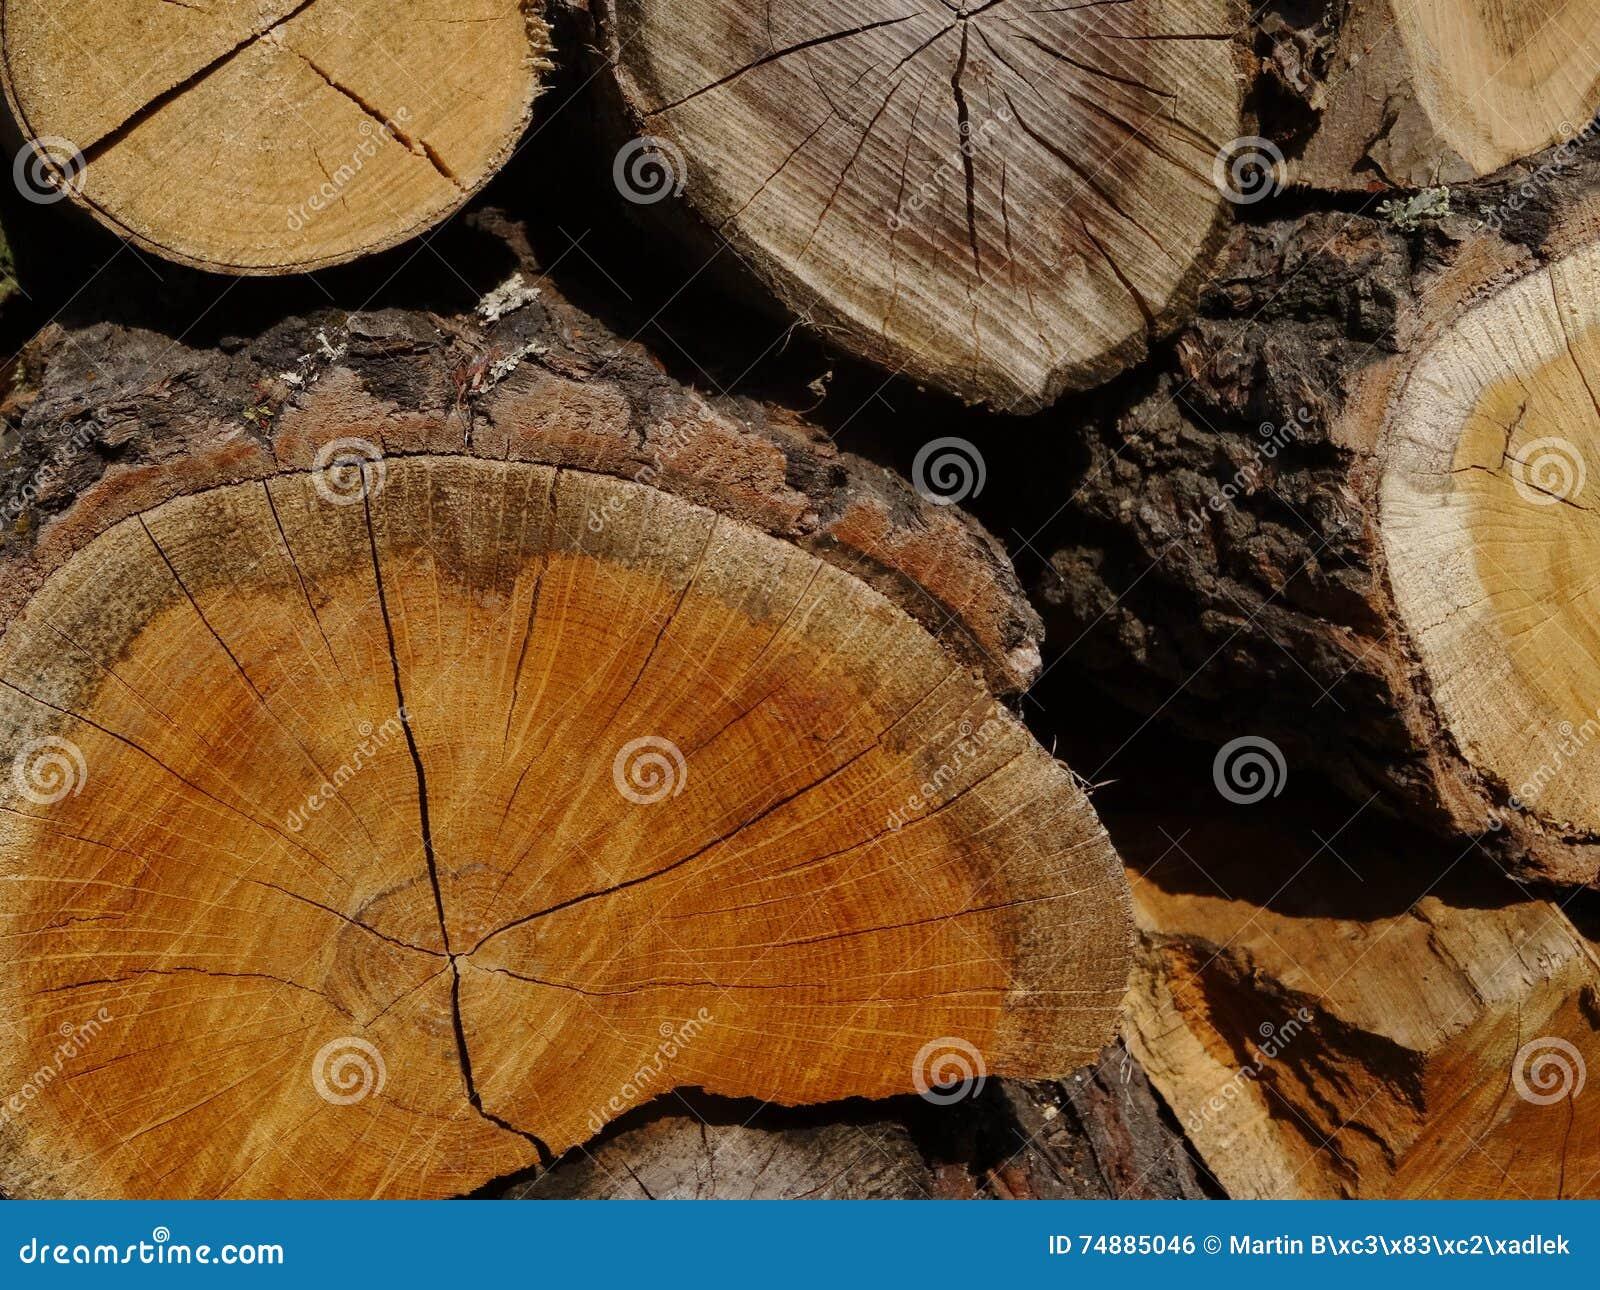 Wood. A trunk.